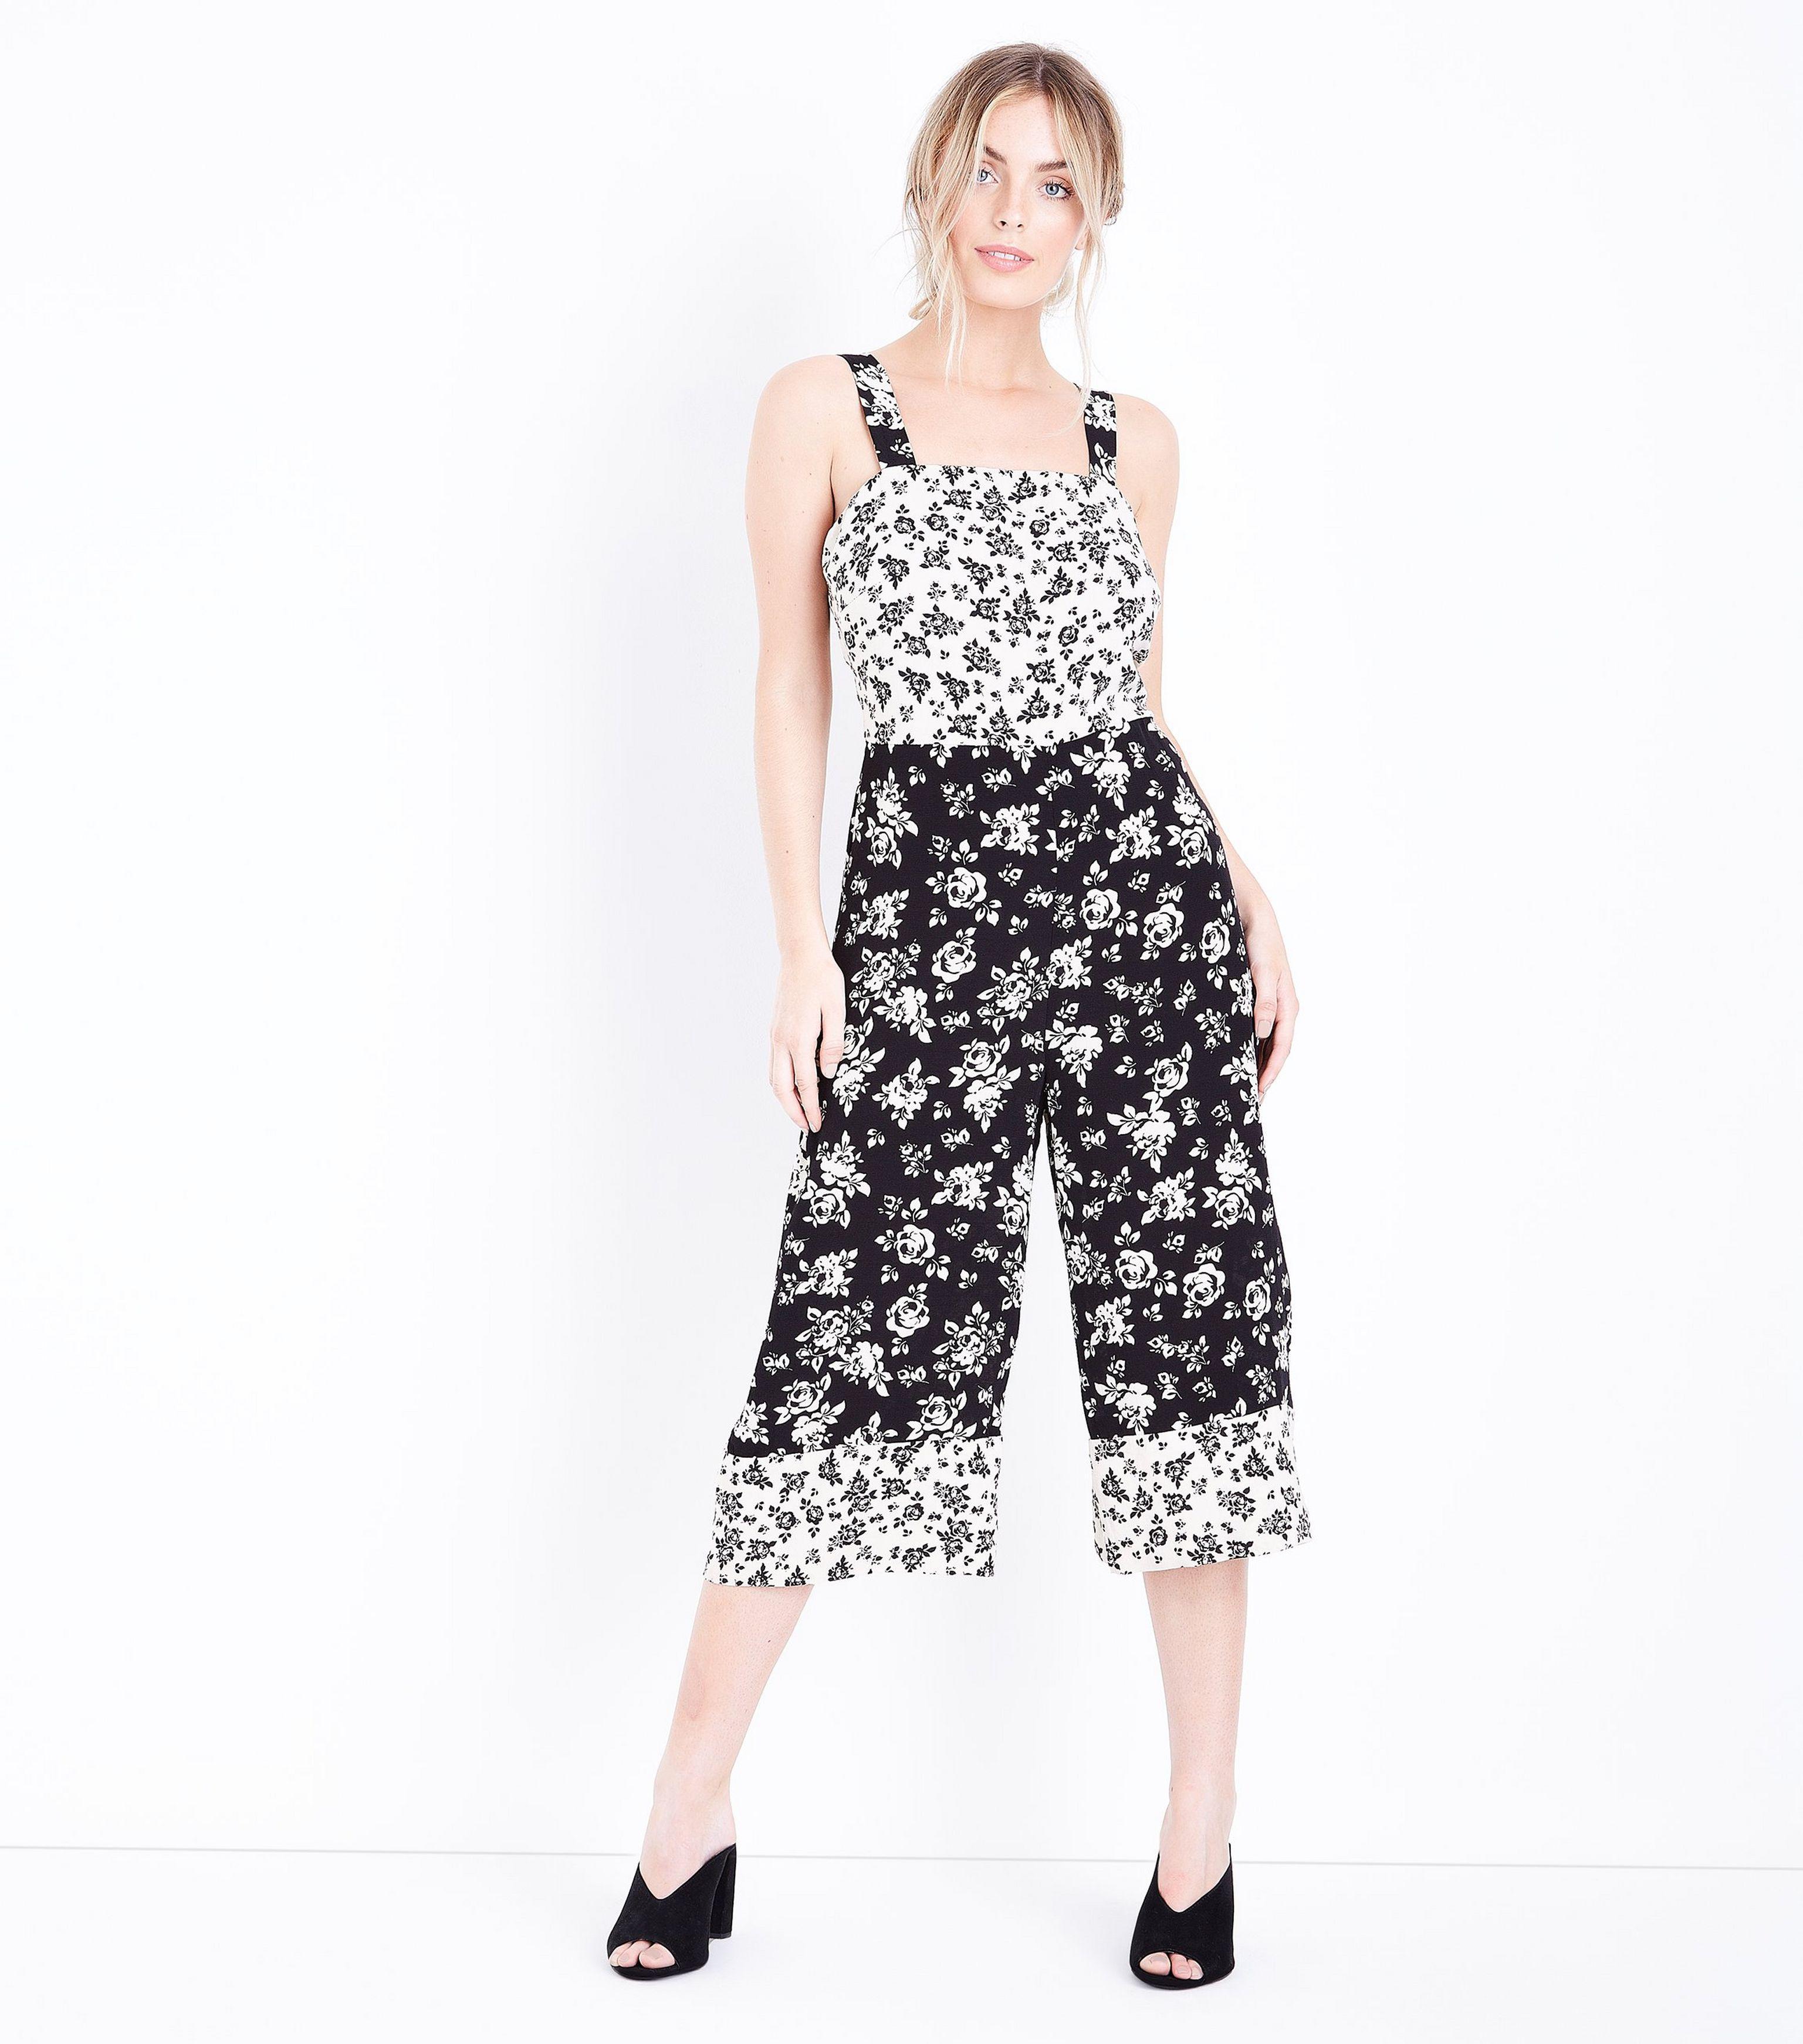 3960142c9ff8 New Look Petite Black Floral Culotte Jumpsuit in Black - Lyst